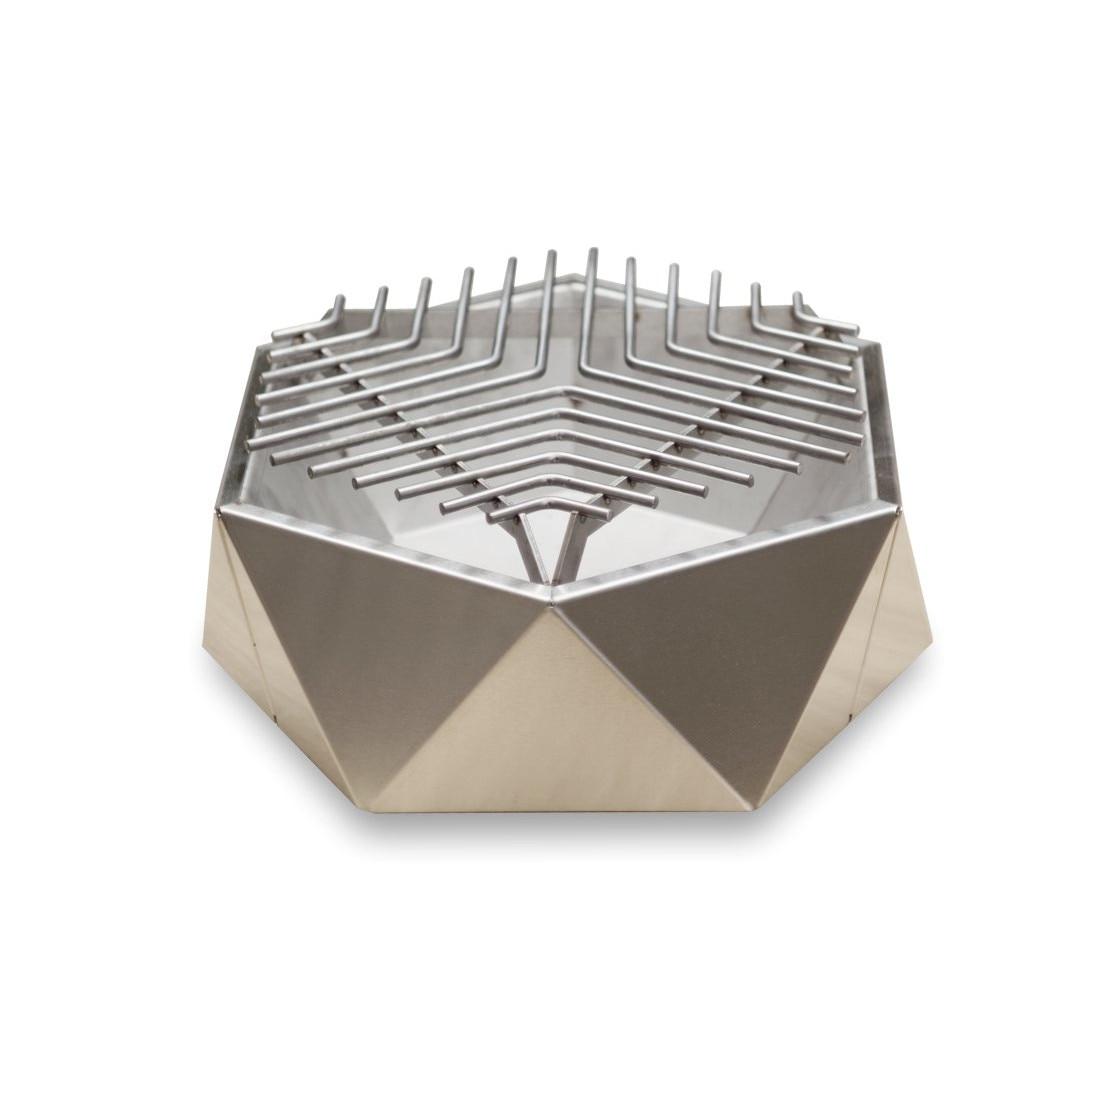 Mini Grill Top Table, rozsdamentes acél, átmérője 37 cm